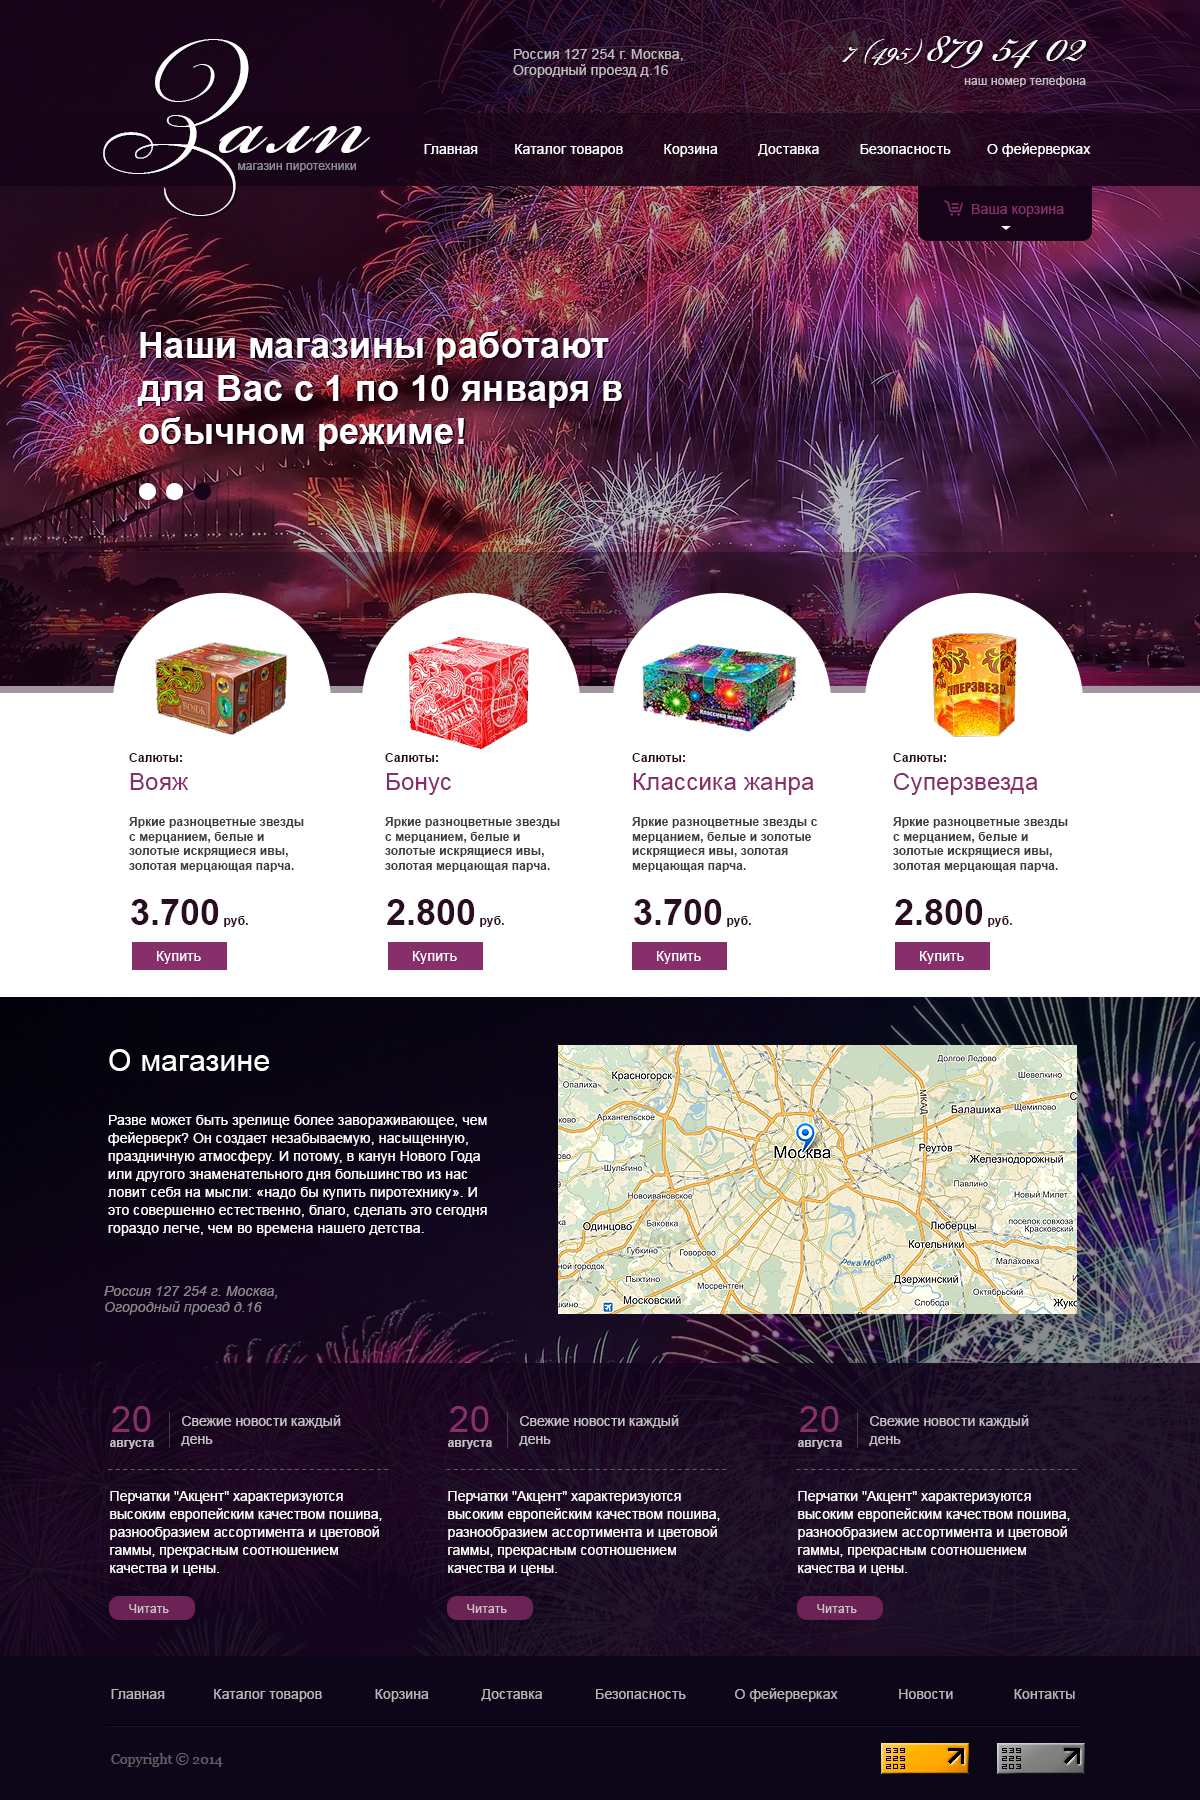 Дизайн интернет-магазина по продаже пиротехники.